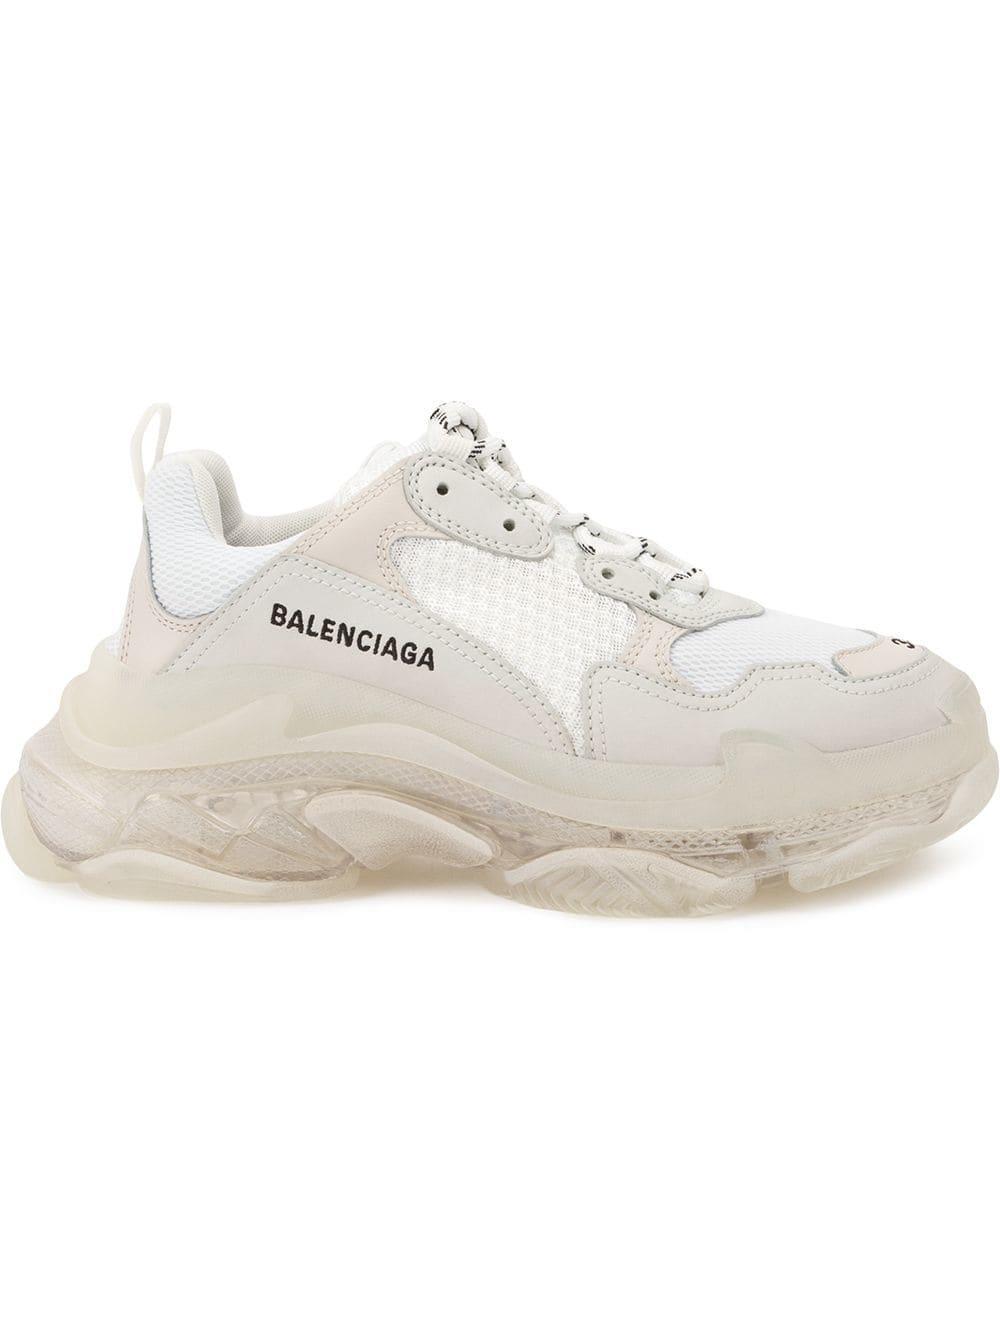 13566e22f36dd Balenciaga - White Triple S Sneakers - Lyst. View fullscreen